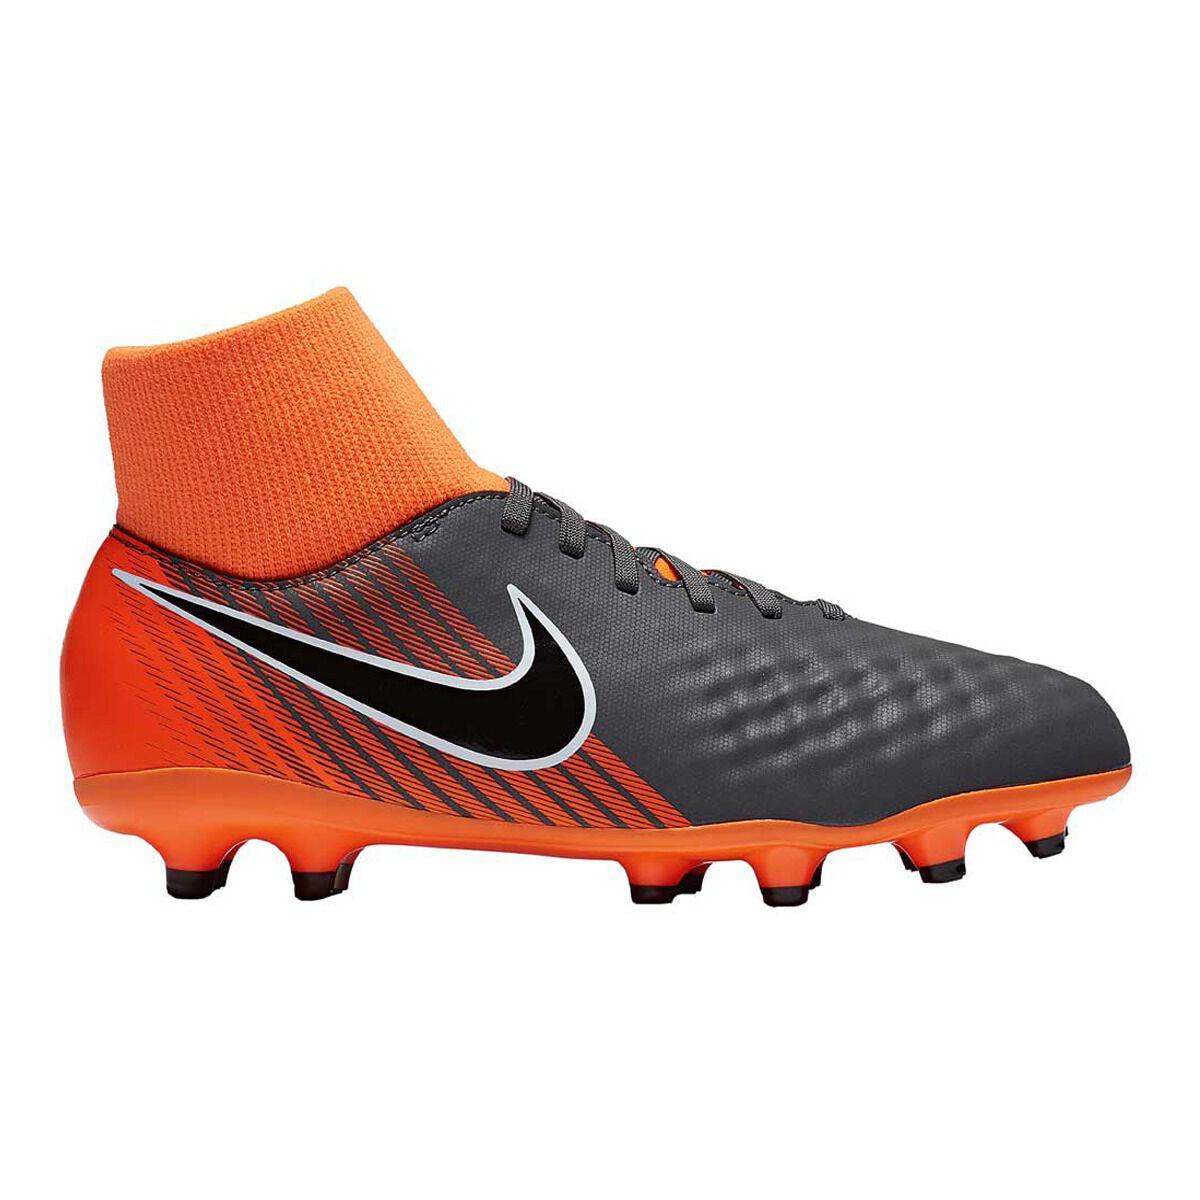 b77eac1c810a ... spain nike magista obra ii academy junior football boots grey orange us  1 junior grey 5495a